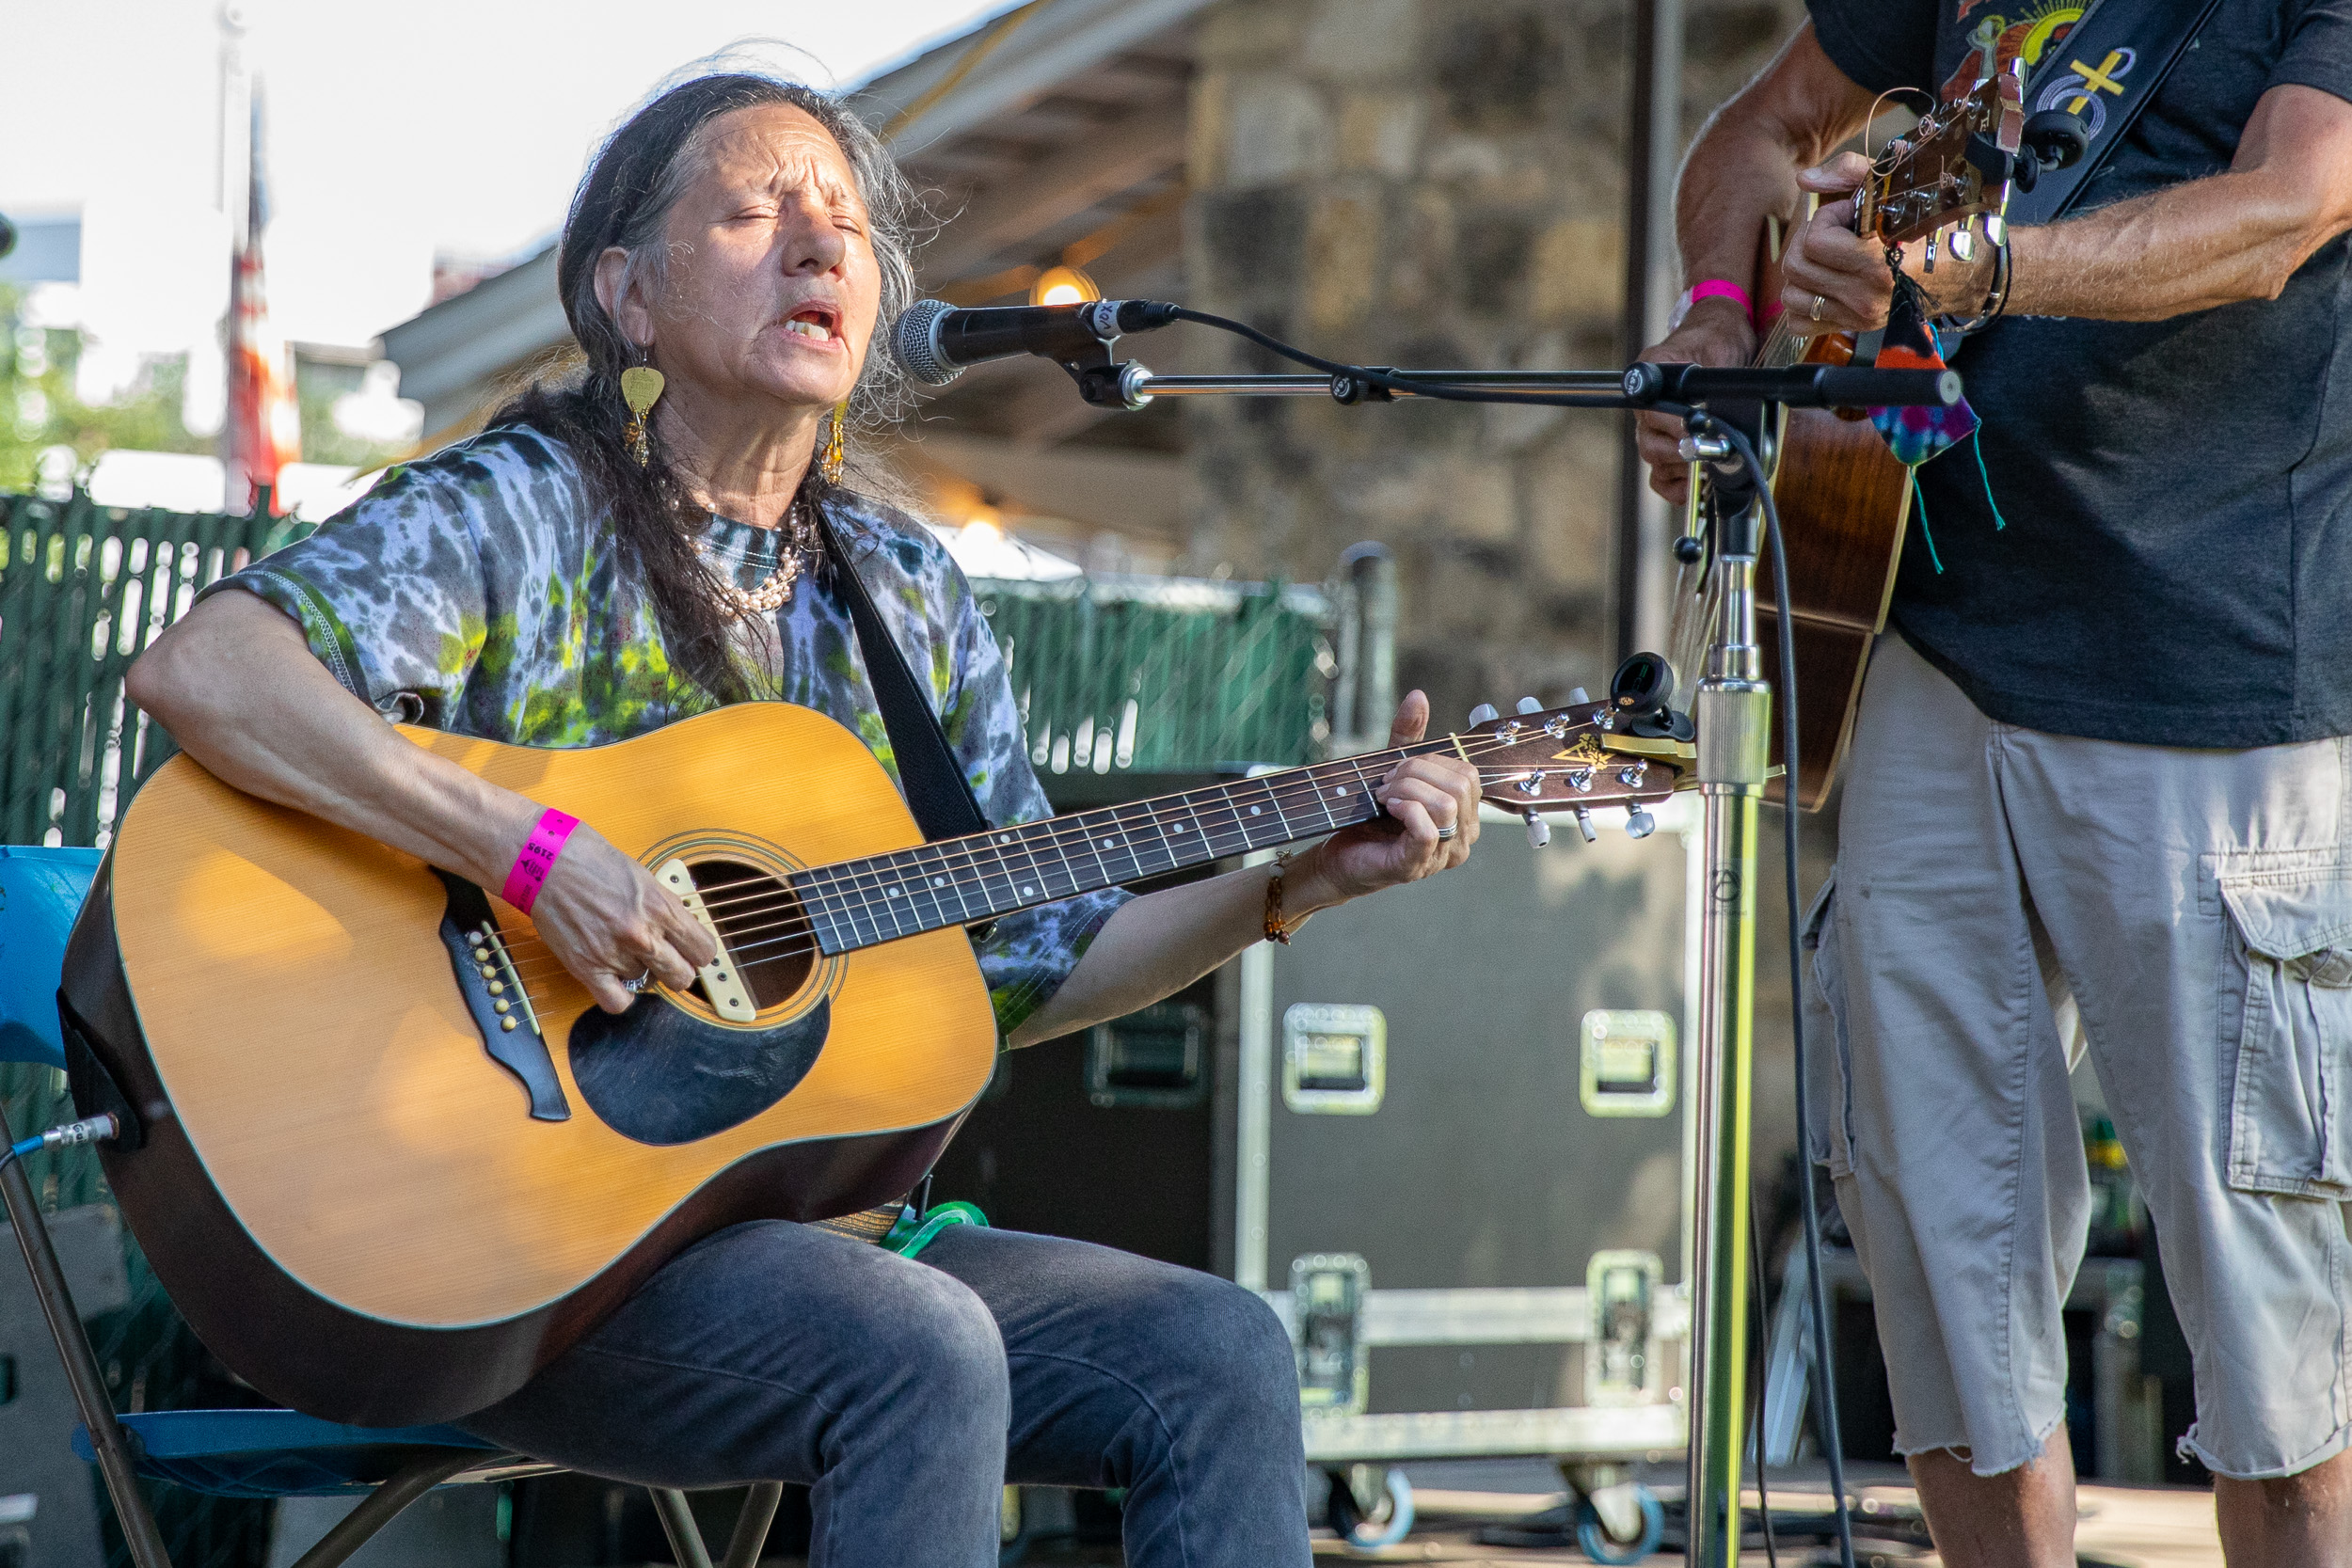 Del La Vega entertains the crowd at the Folklife Festival. (Photo by  Joel Pena  - Photographer, SA Sentinel)